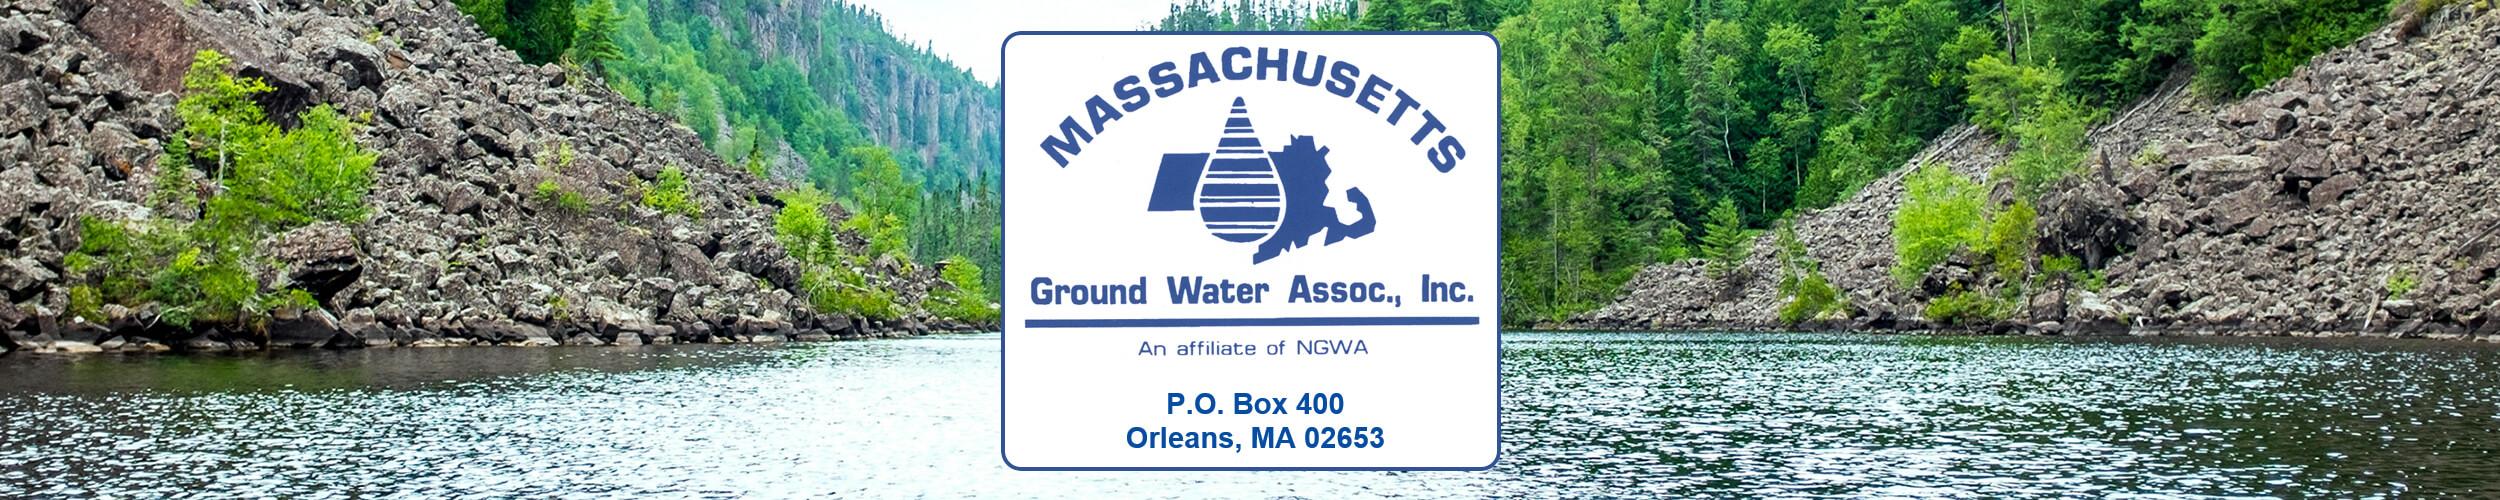 Massachusetts Ground Water Association